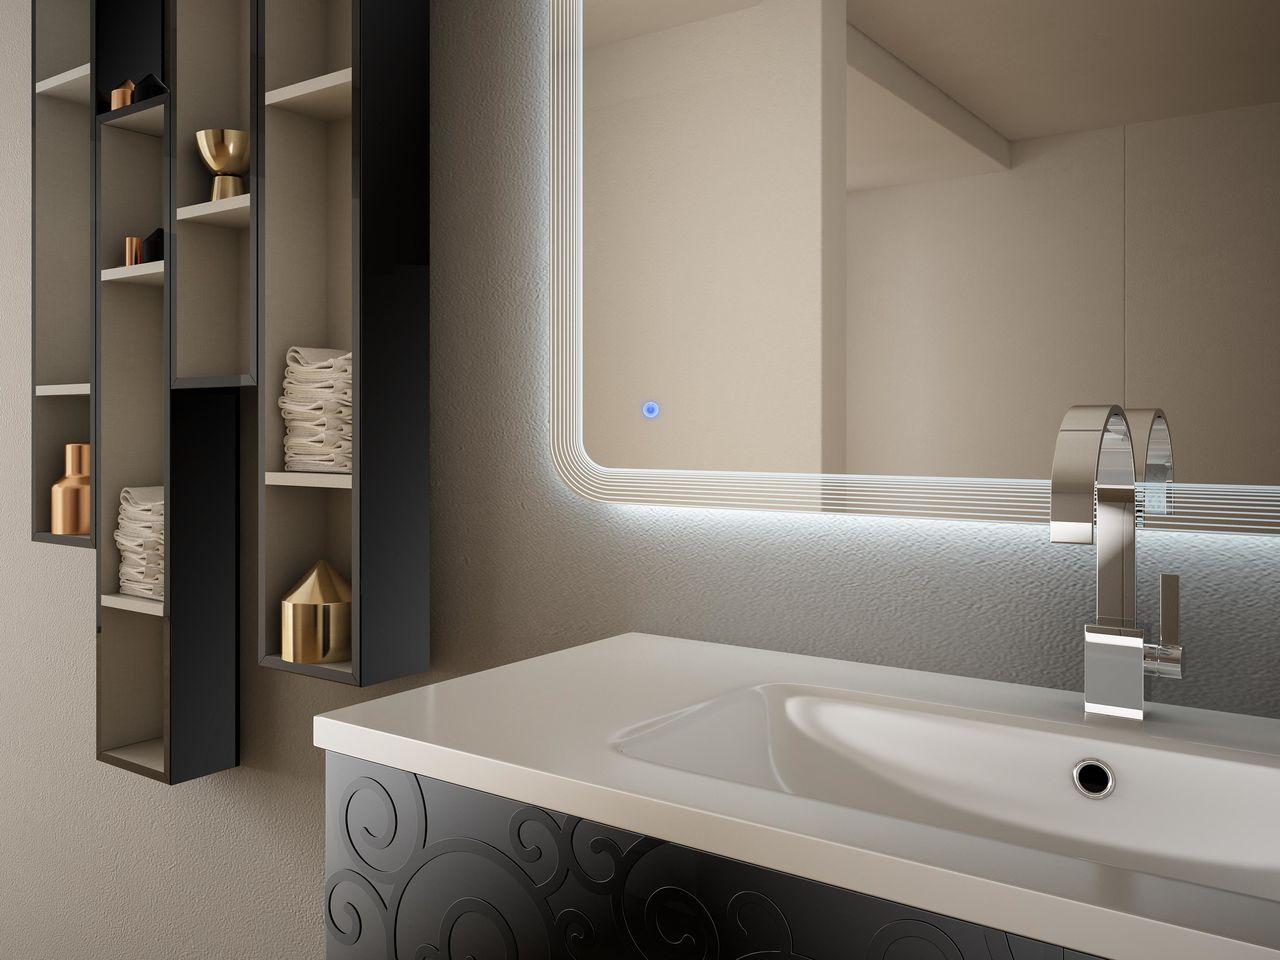 Mobile arredo da bagno milos sospeso 100 cm bianco nero lucido lavabo in ceramica - Mobile bagno bianco lucido ...